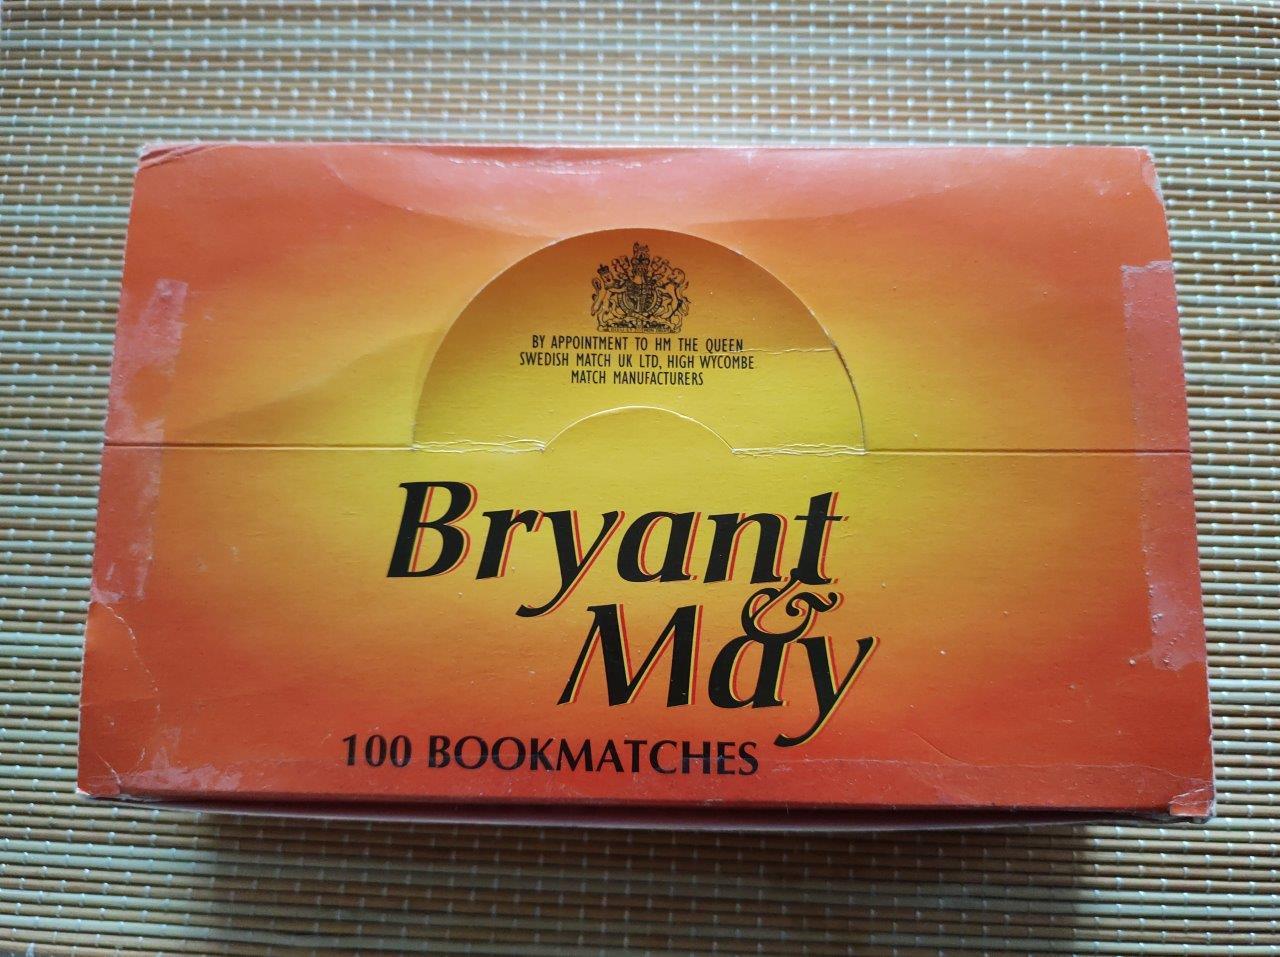 Bryant & May caddy, 130 x 51 mm